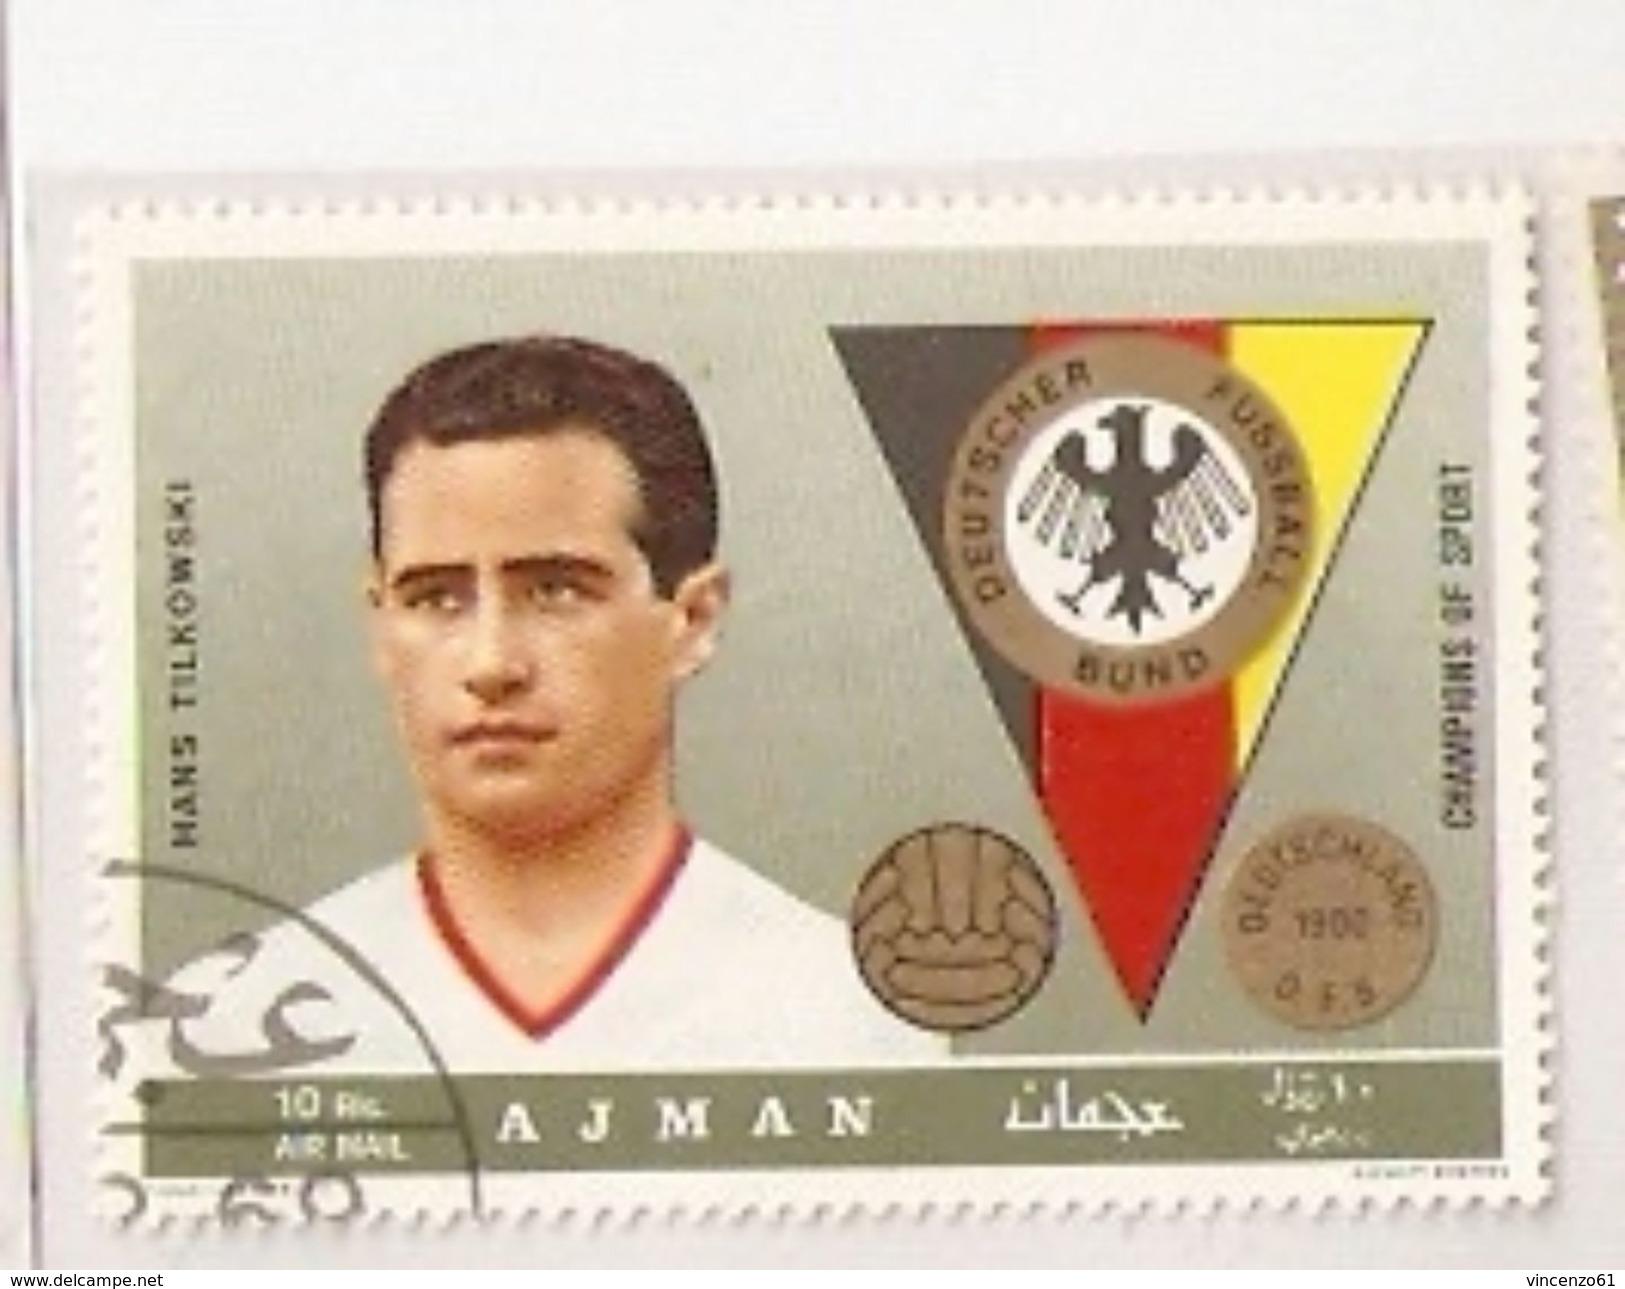 AJMAN GERMANY TEAM HANS TILKOWSKI  FIFA WORLD CUP 1974 GERMANY 1974 - Coppa Del Mondo